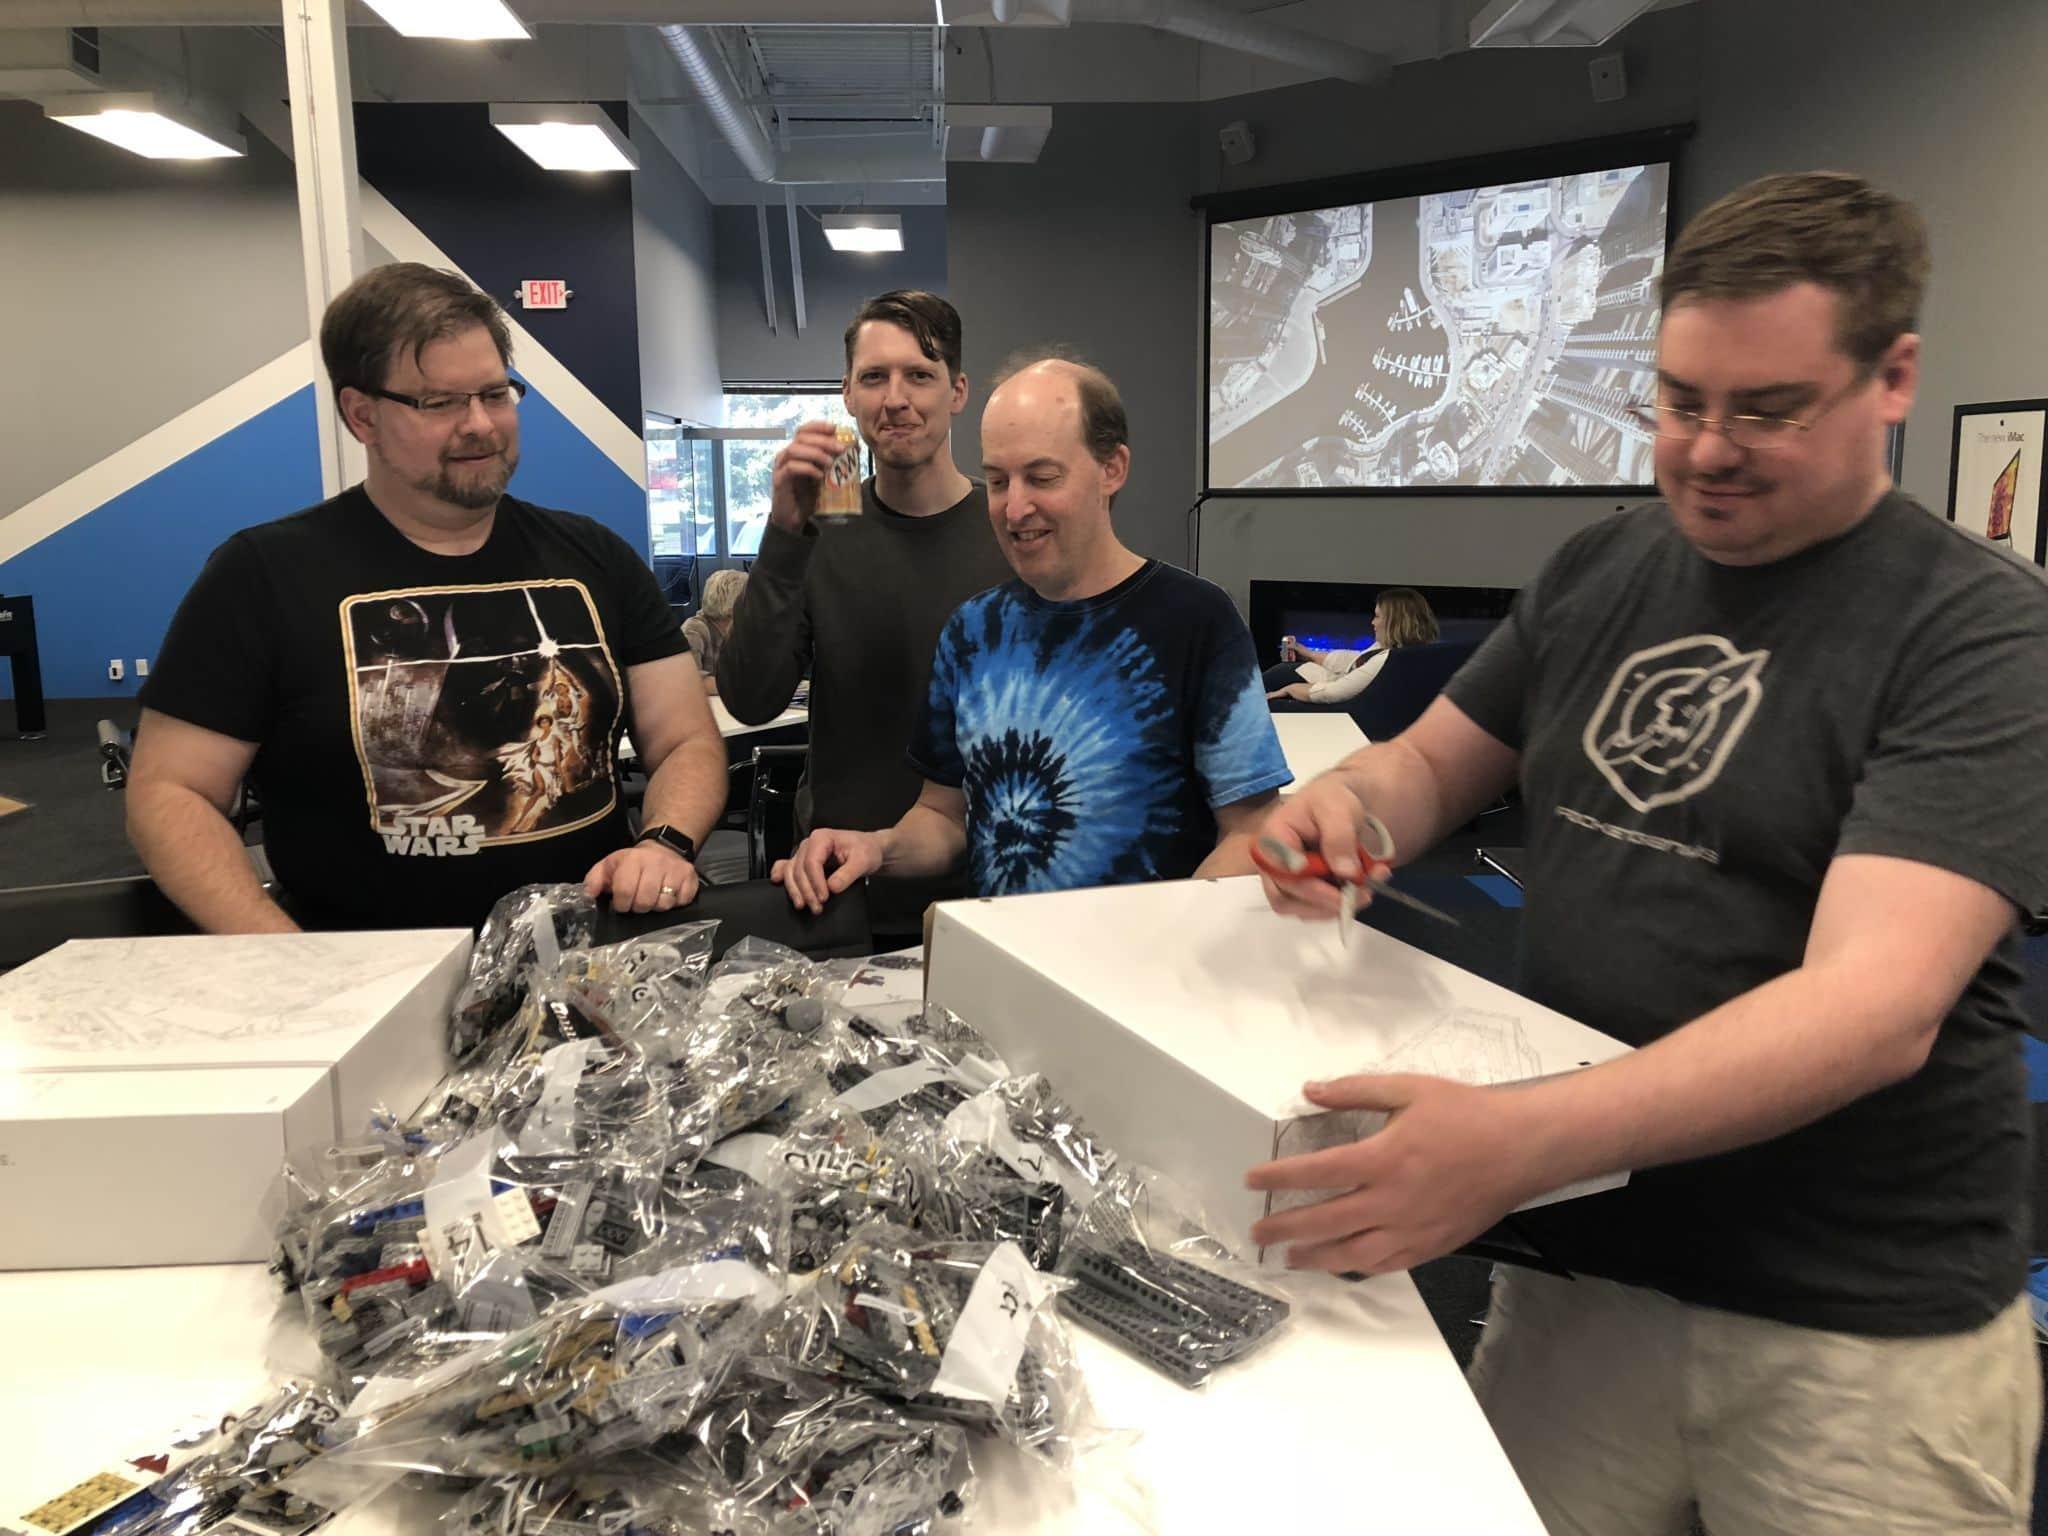 Star Wars Day Activities 8